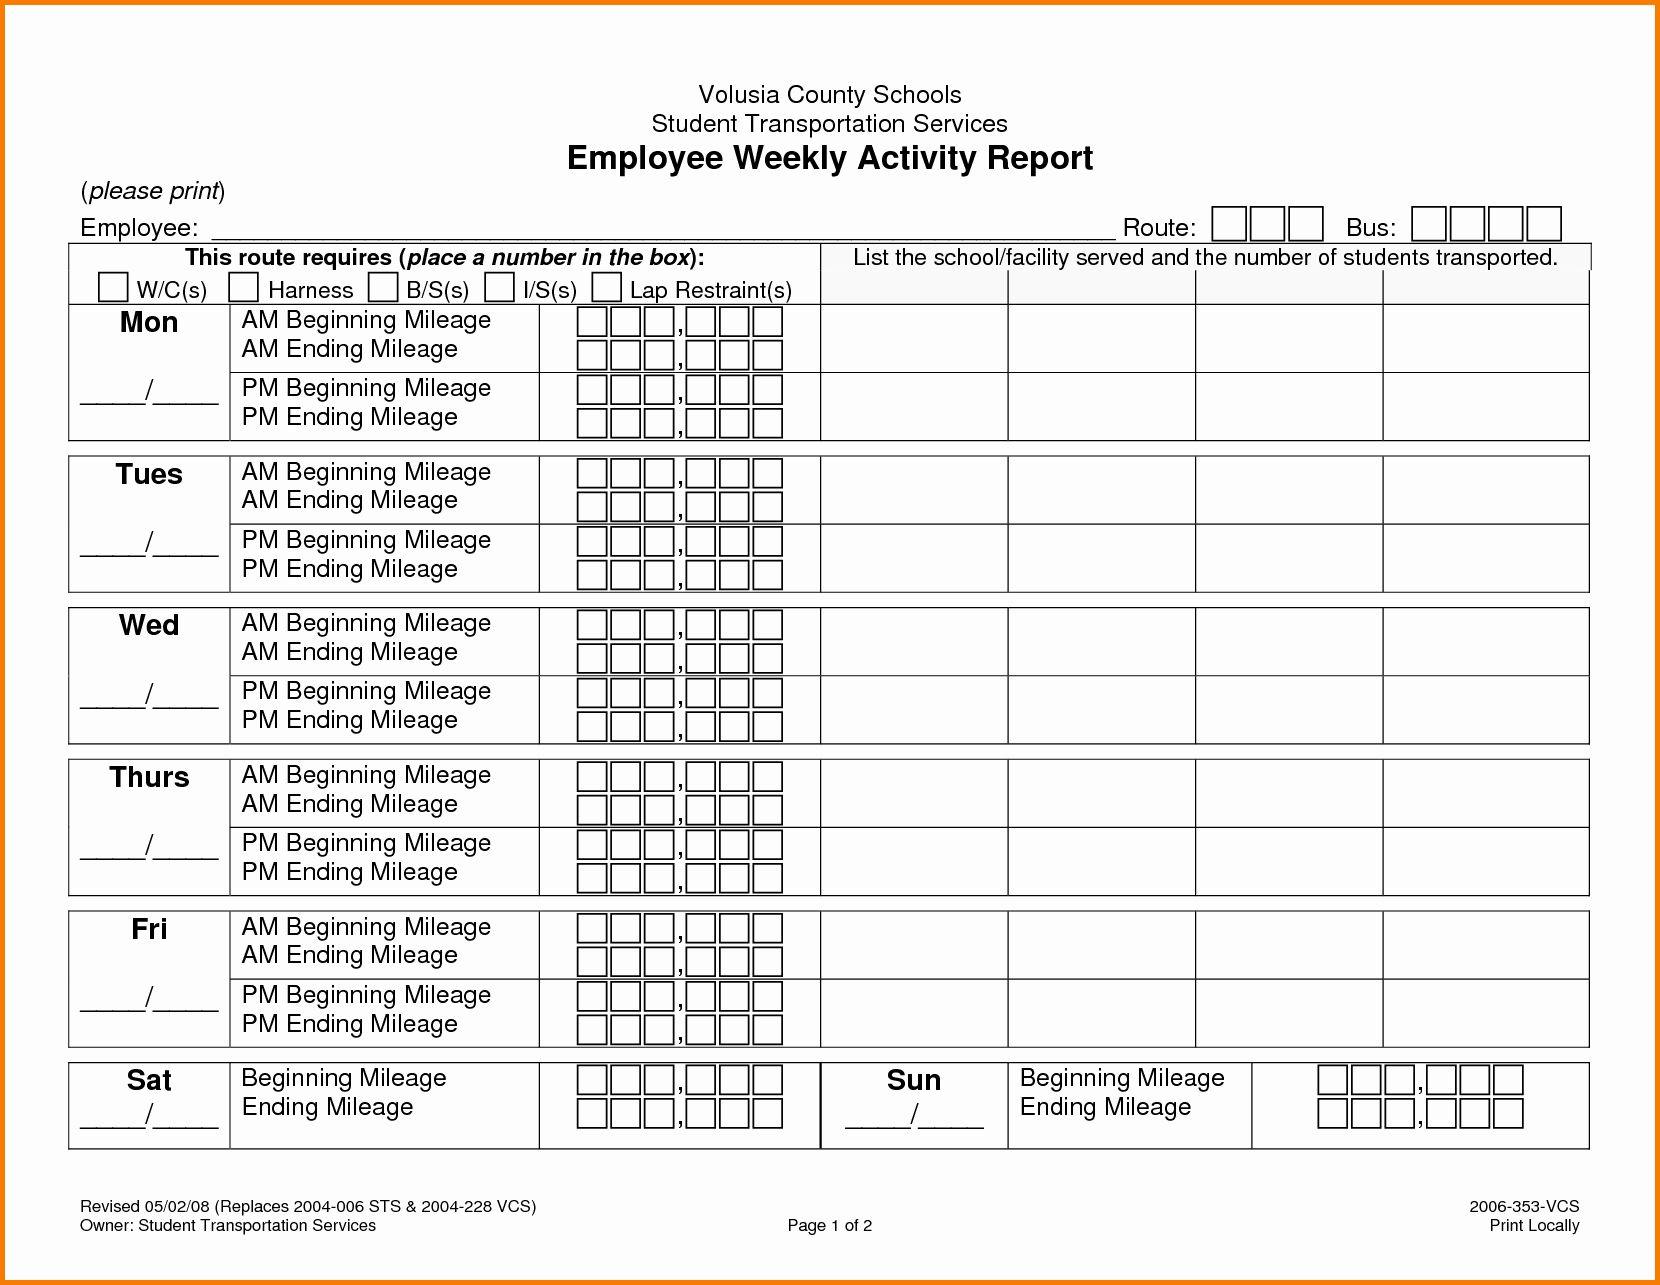 Weekly Sales Report Template Excel Fresh 6 Weekly Activity Report Template Report Template Sales Report Template Professional Templates Weekly sales report template excel